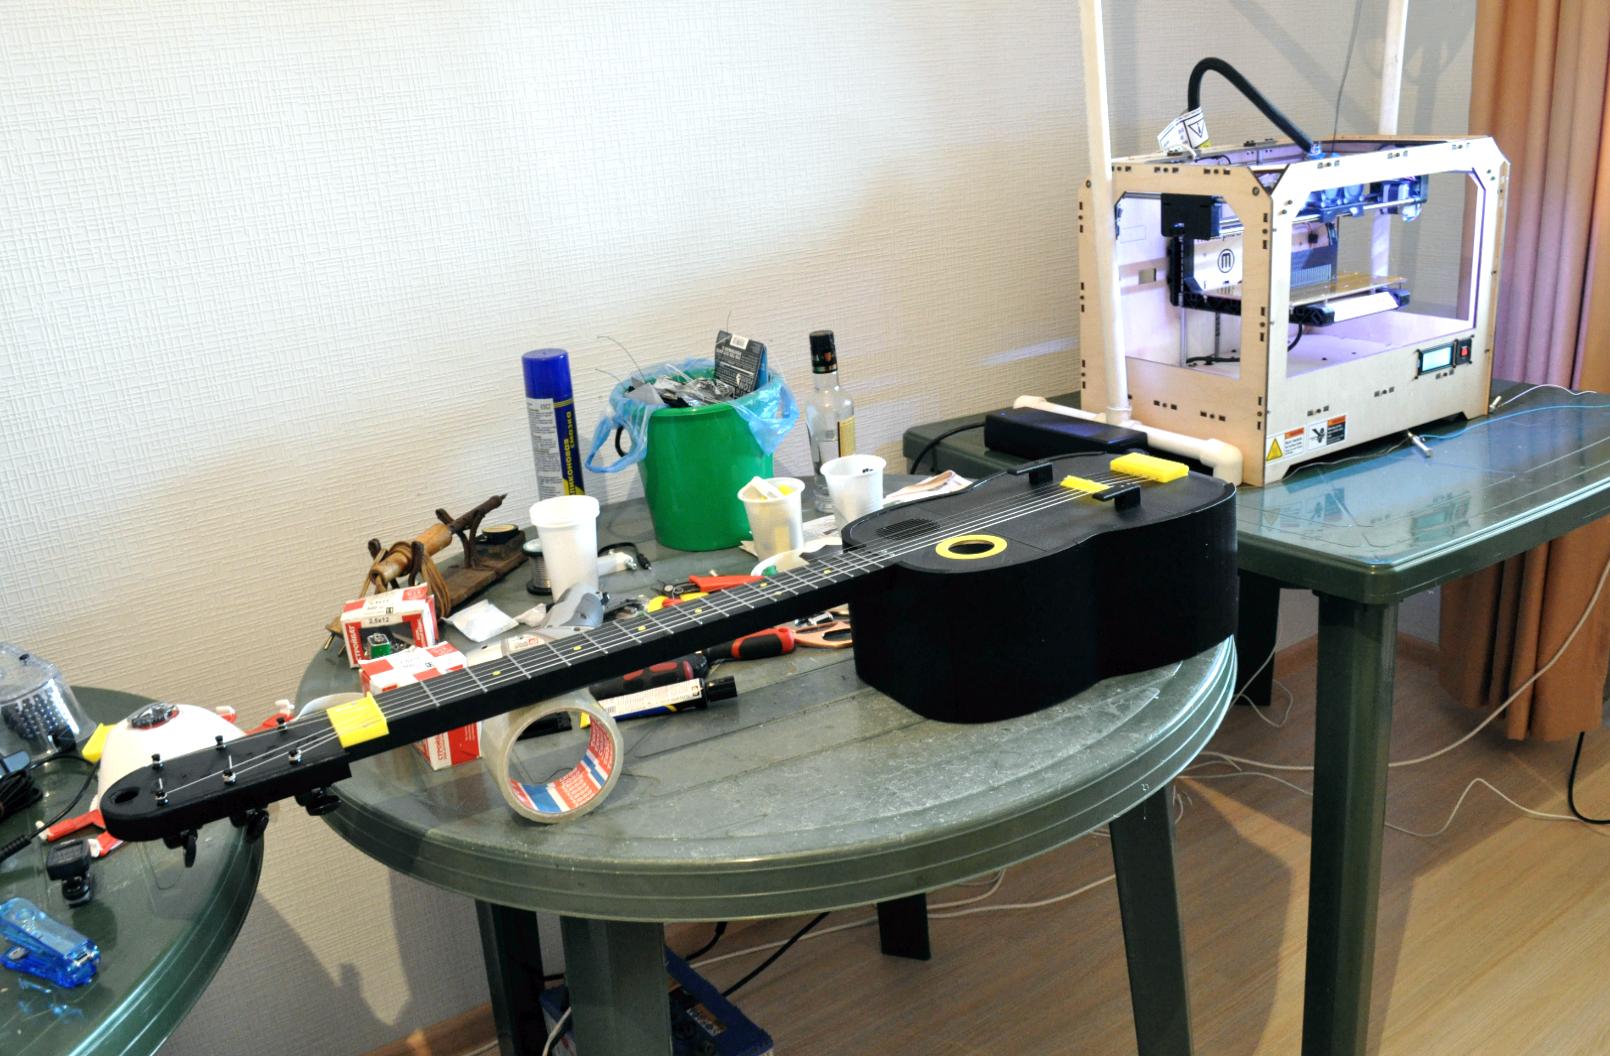 9.png Download free STL file Guitar with built in Amp and Speaker • 3D printable model, CrocodileGene3d